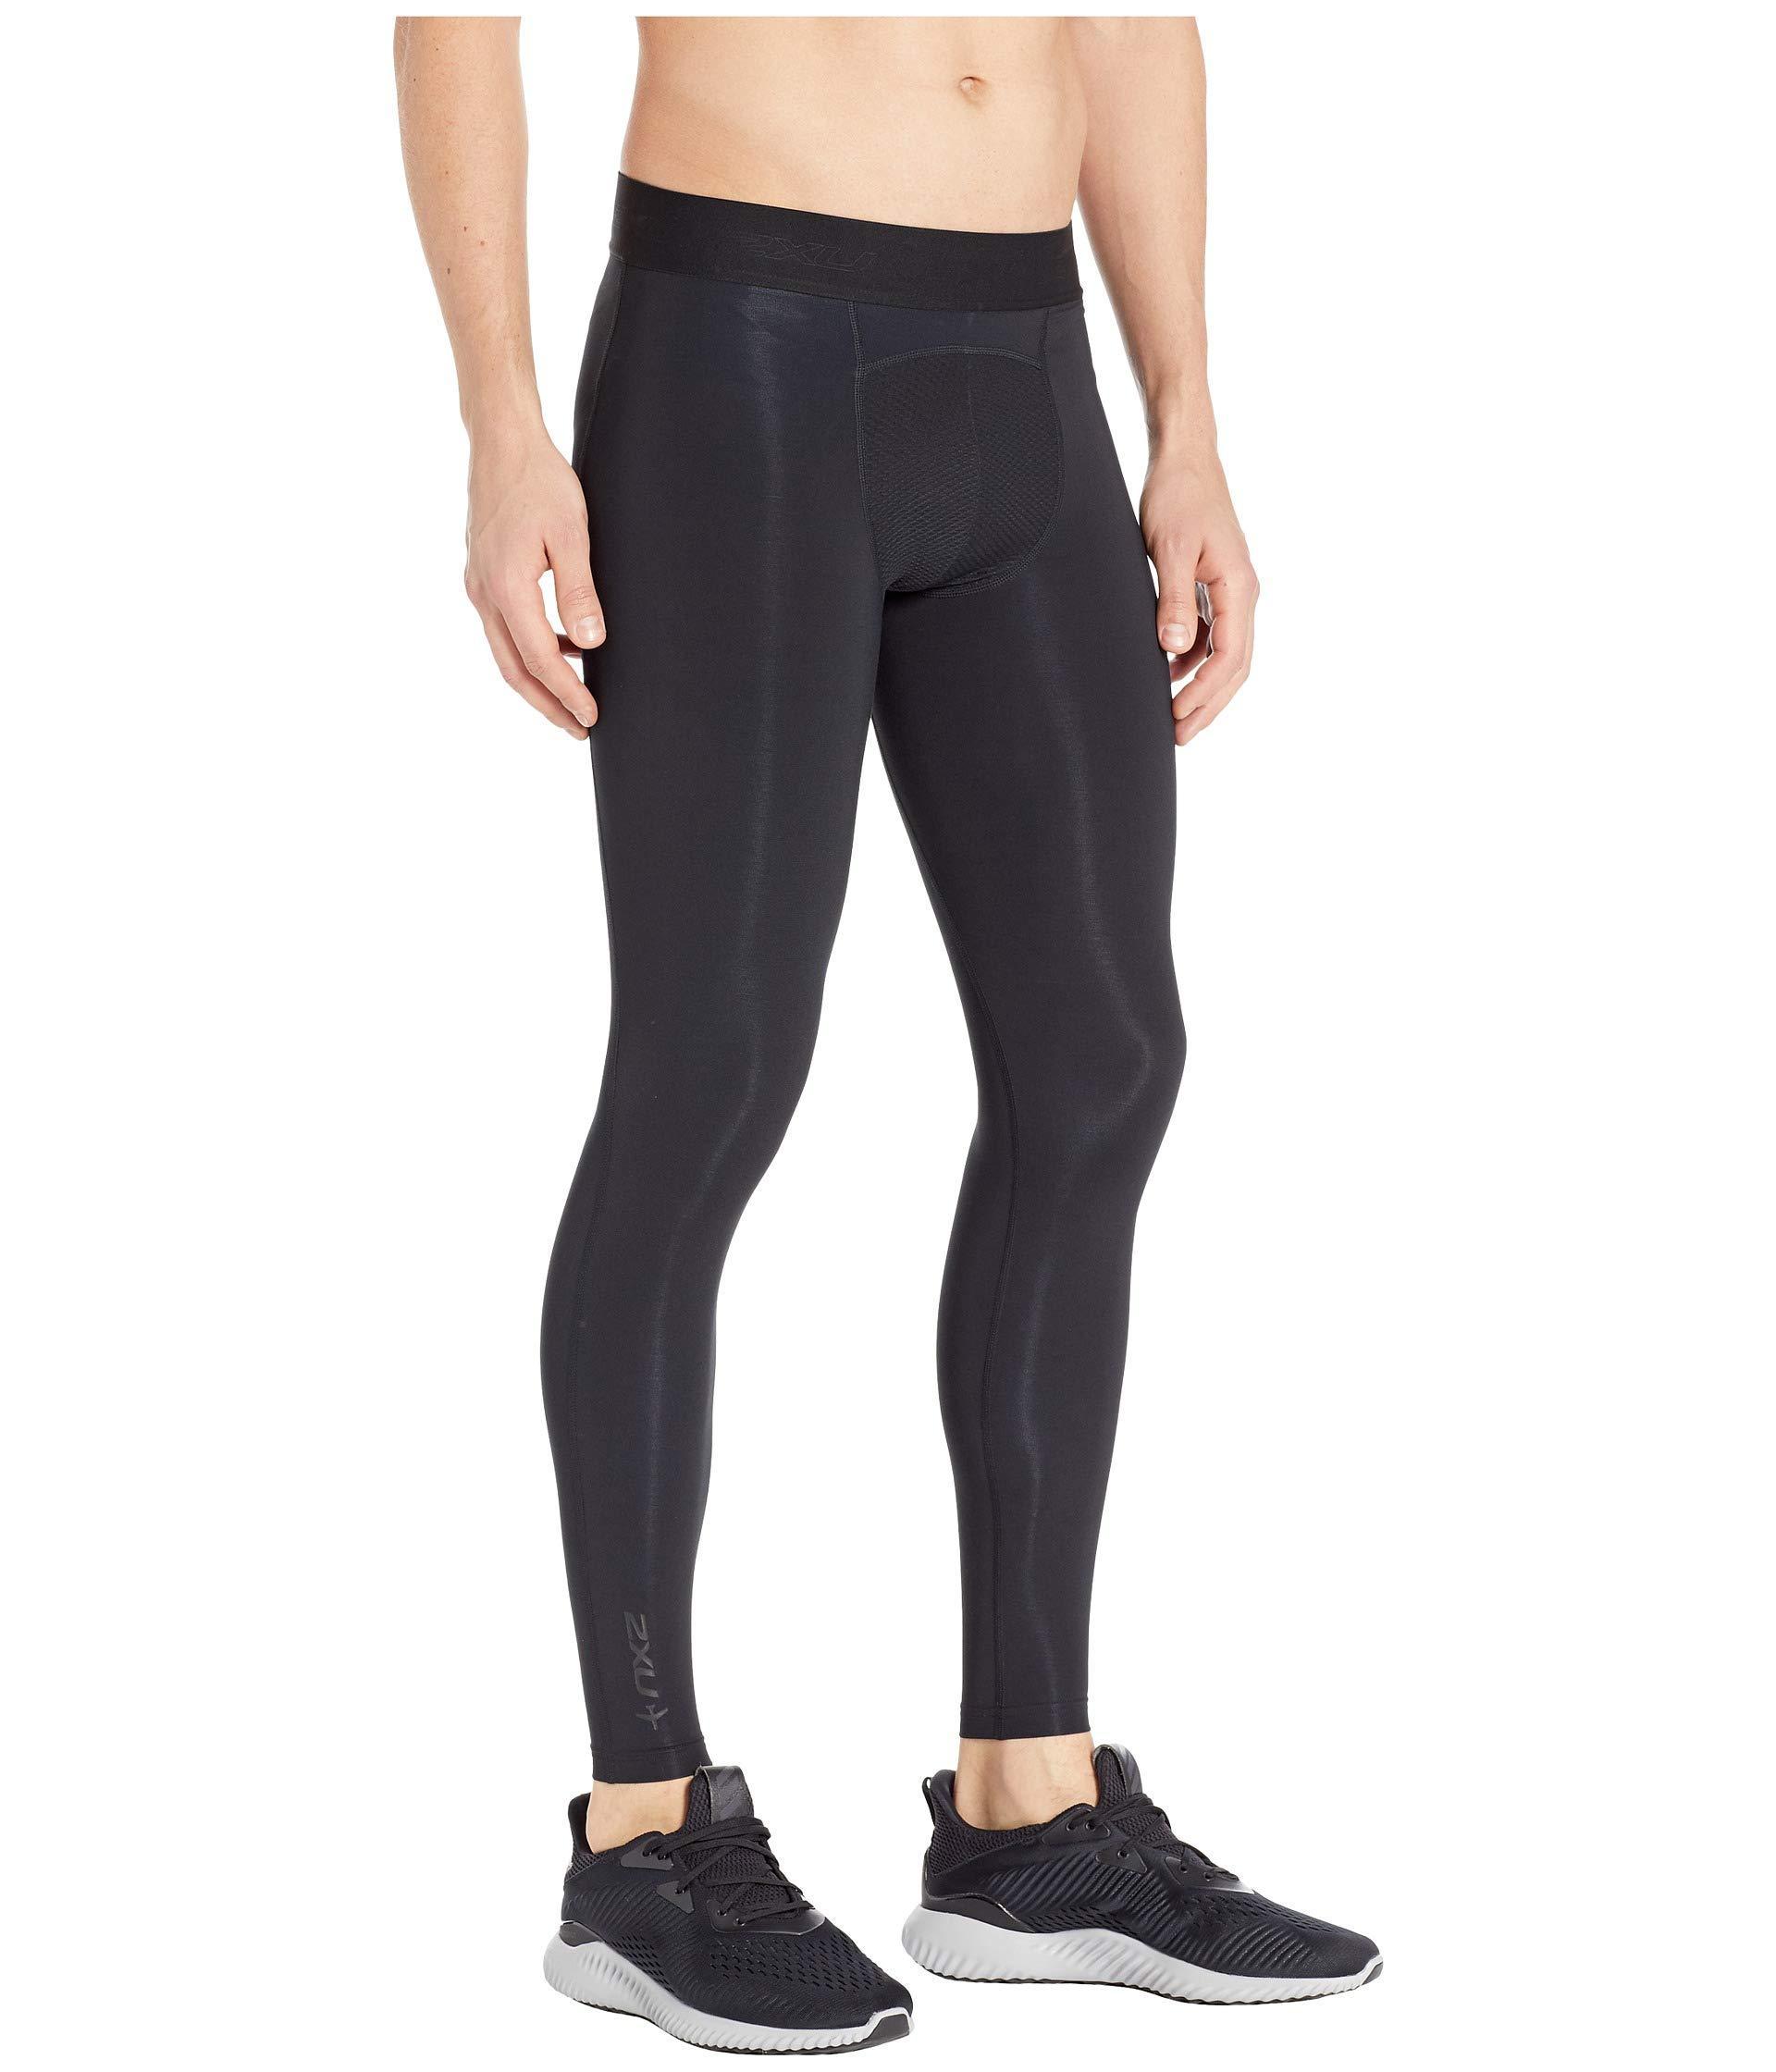 acd3154b8546c 2XU Flight Compression Tights (black/black) Men's Casual Pants in ...